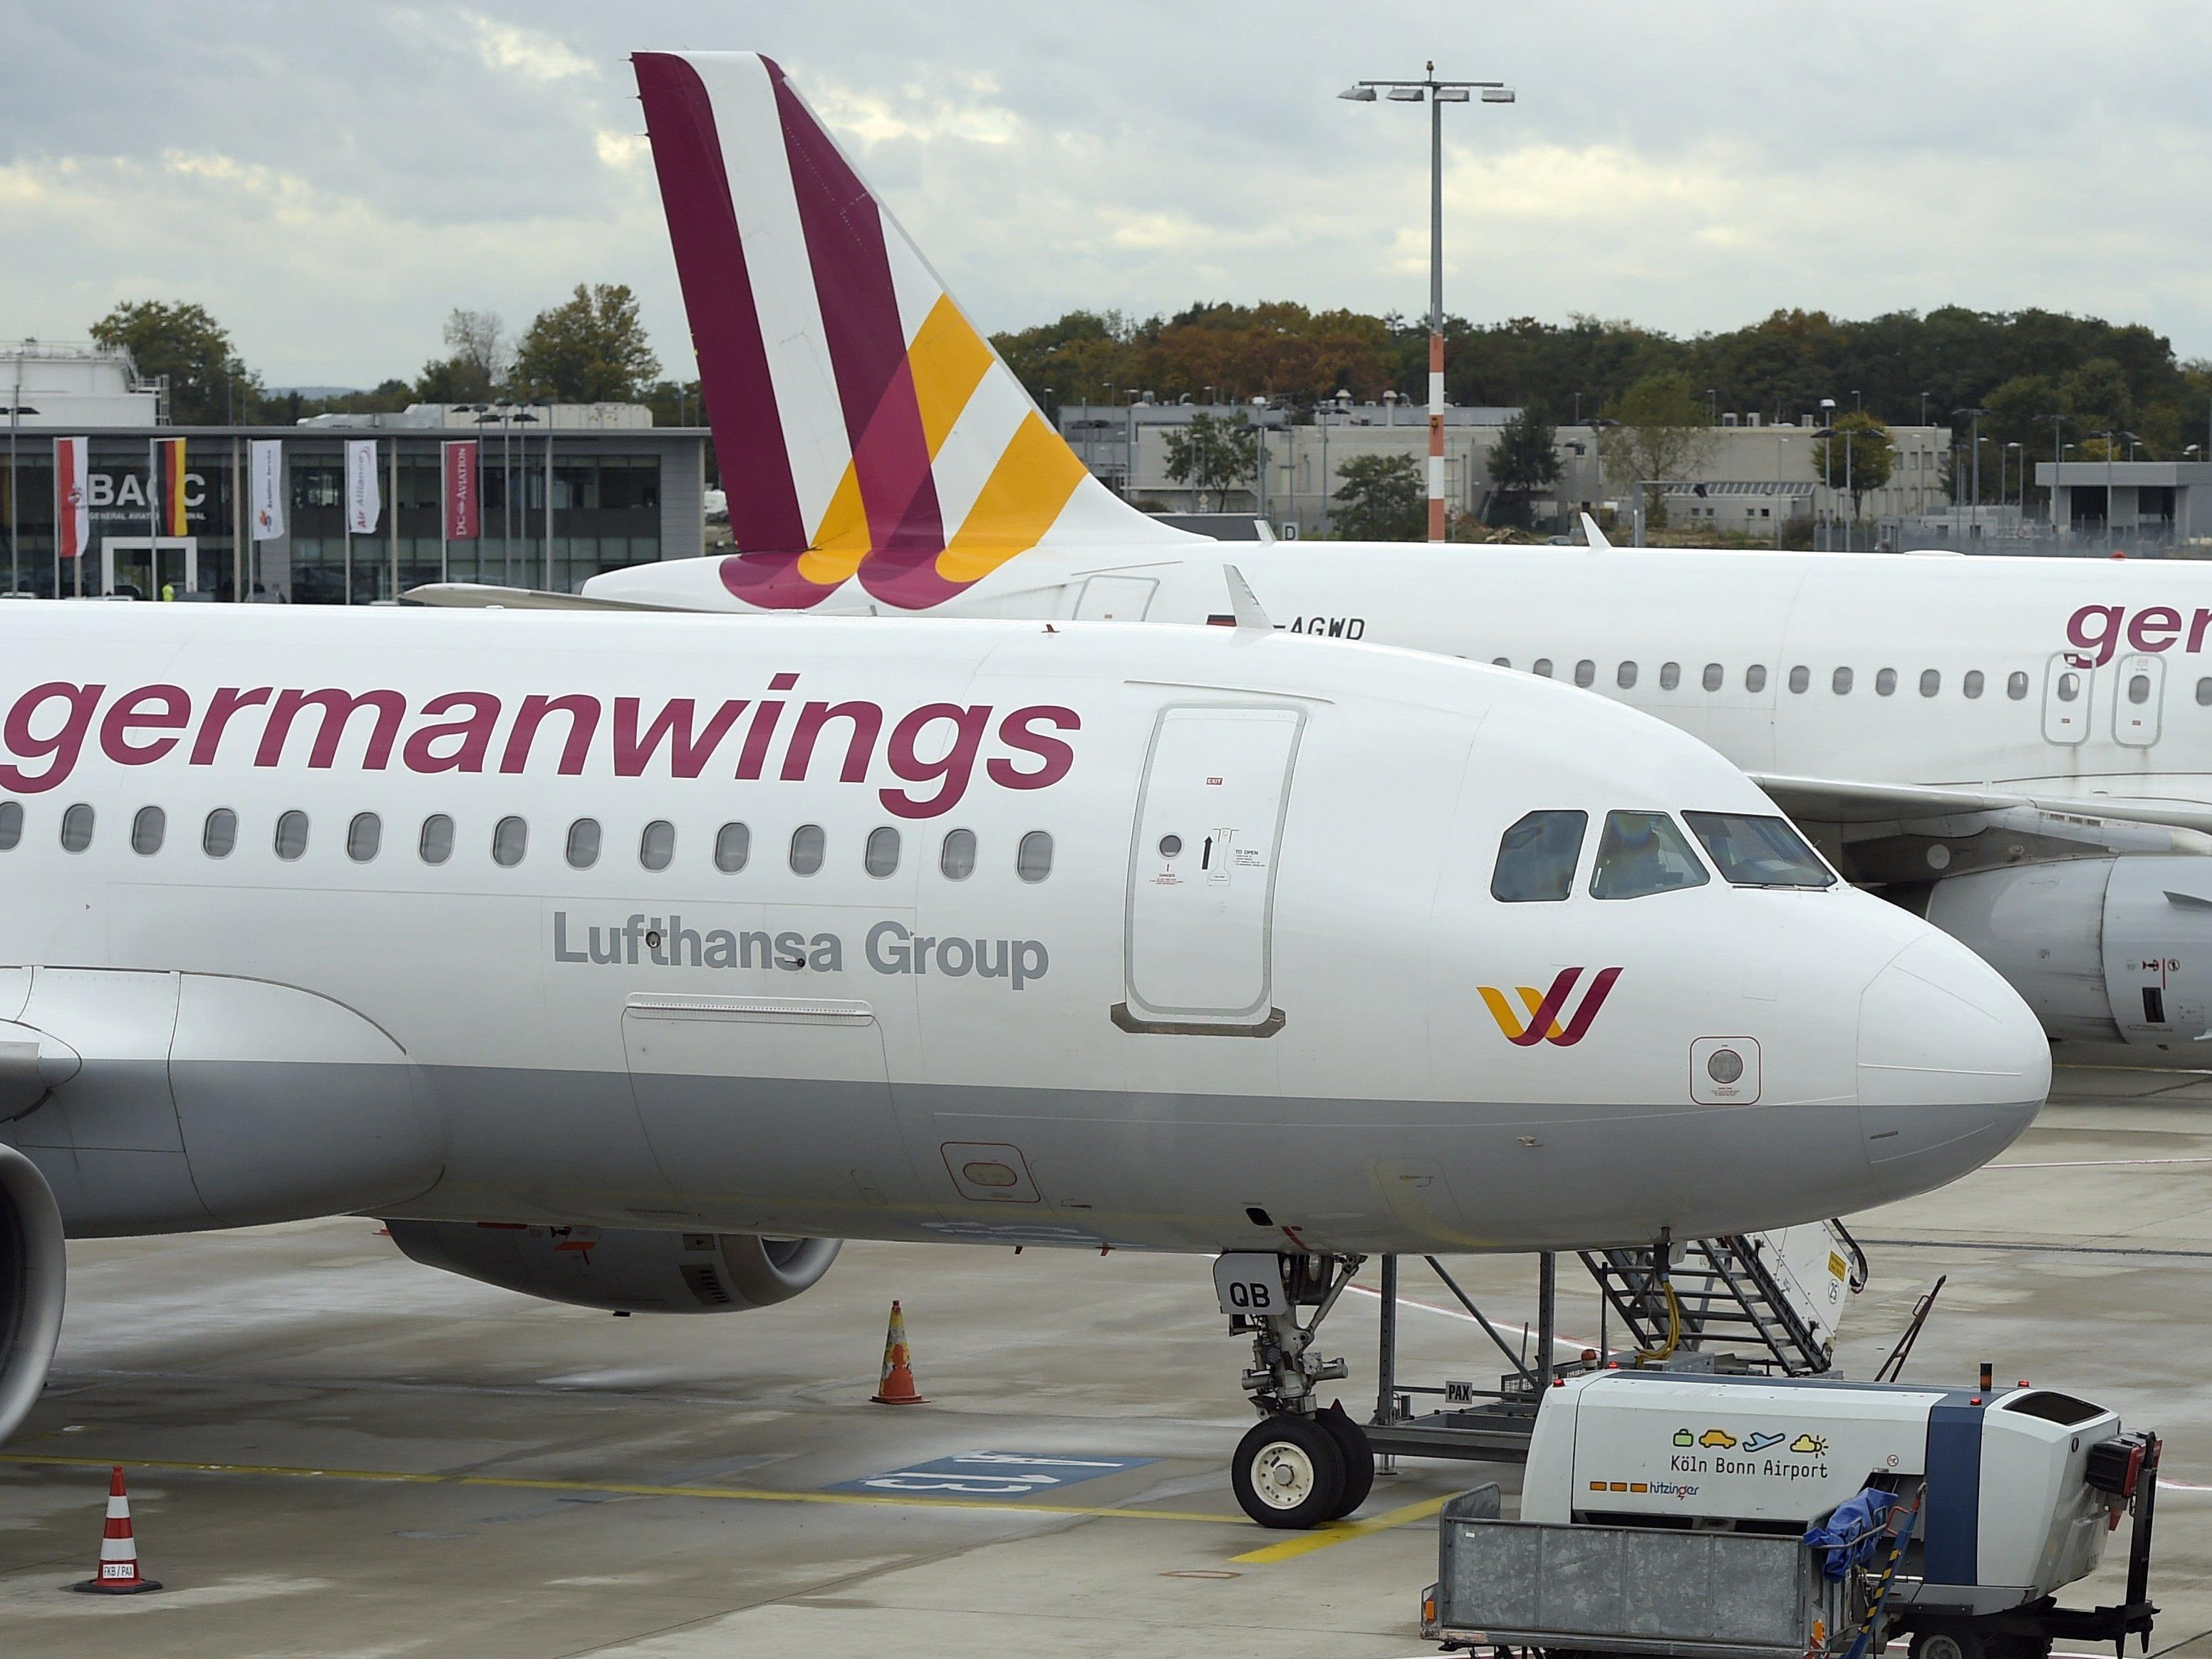 Germanwings-Airbus A320 in Südfrankreich abgestürzt.